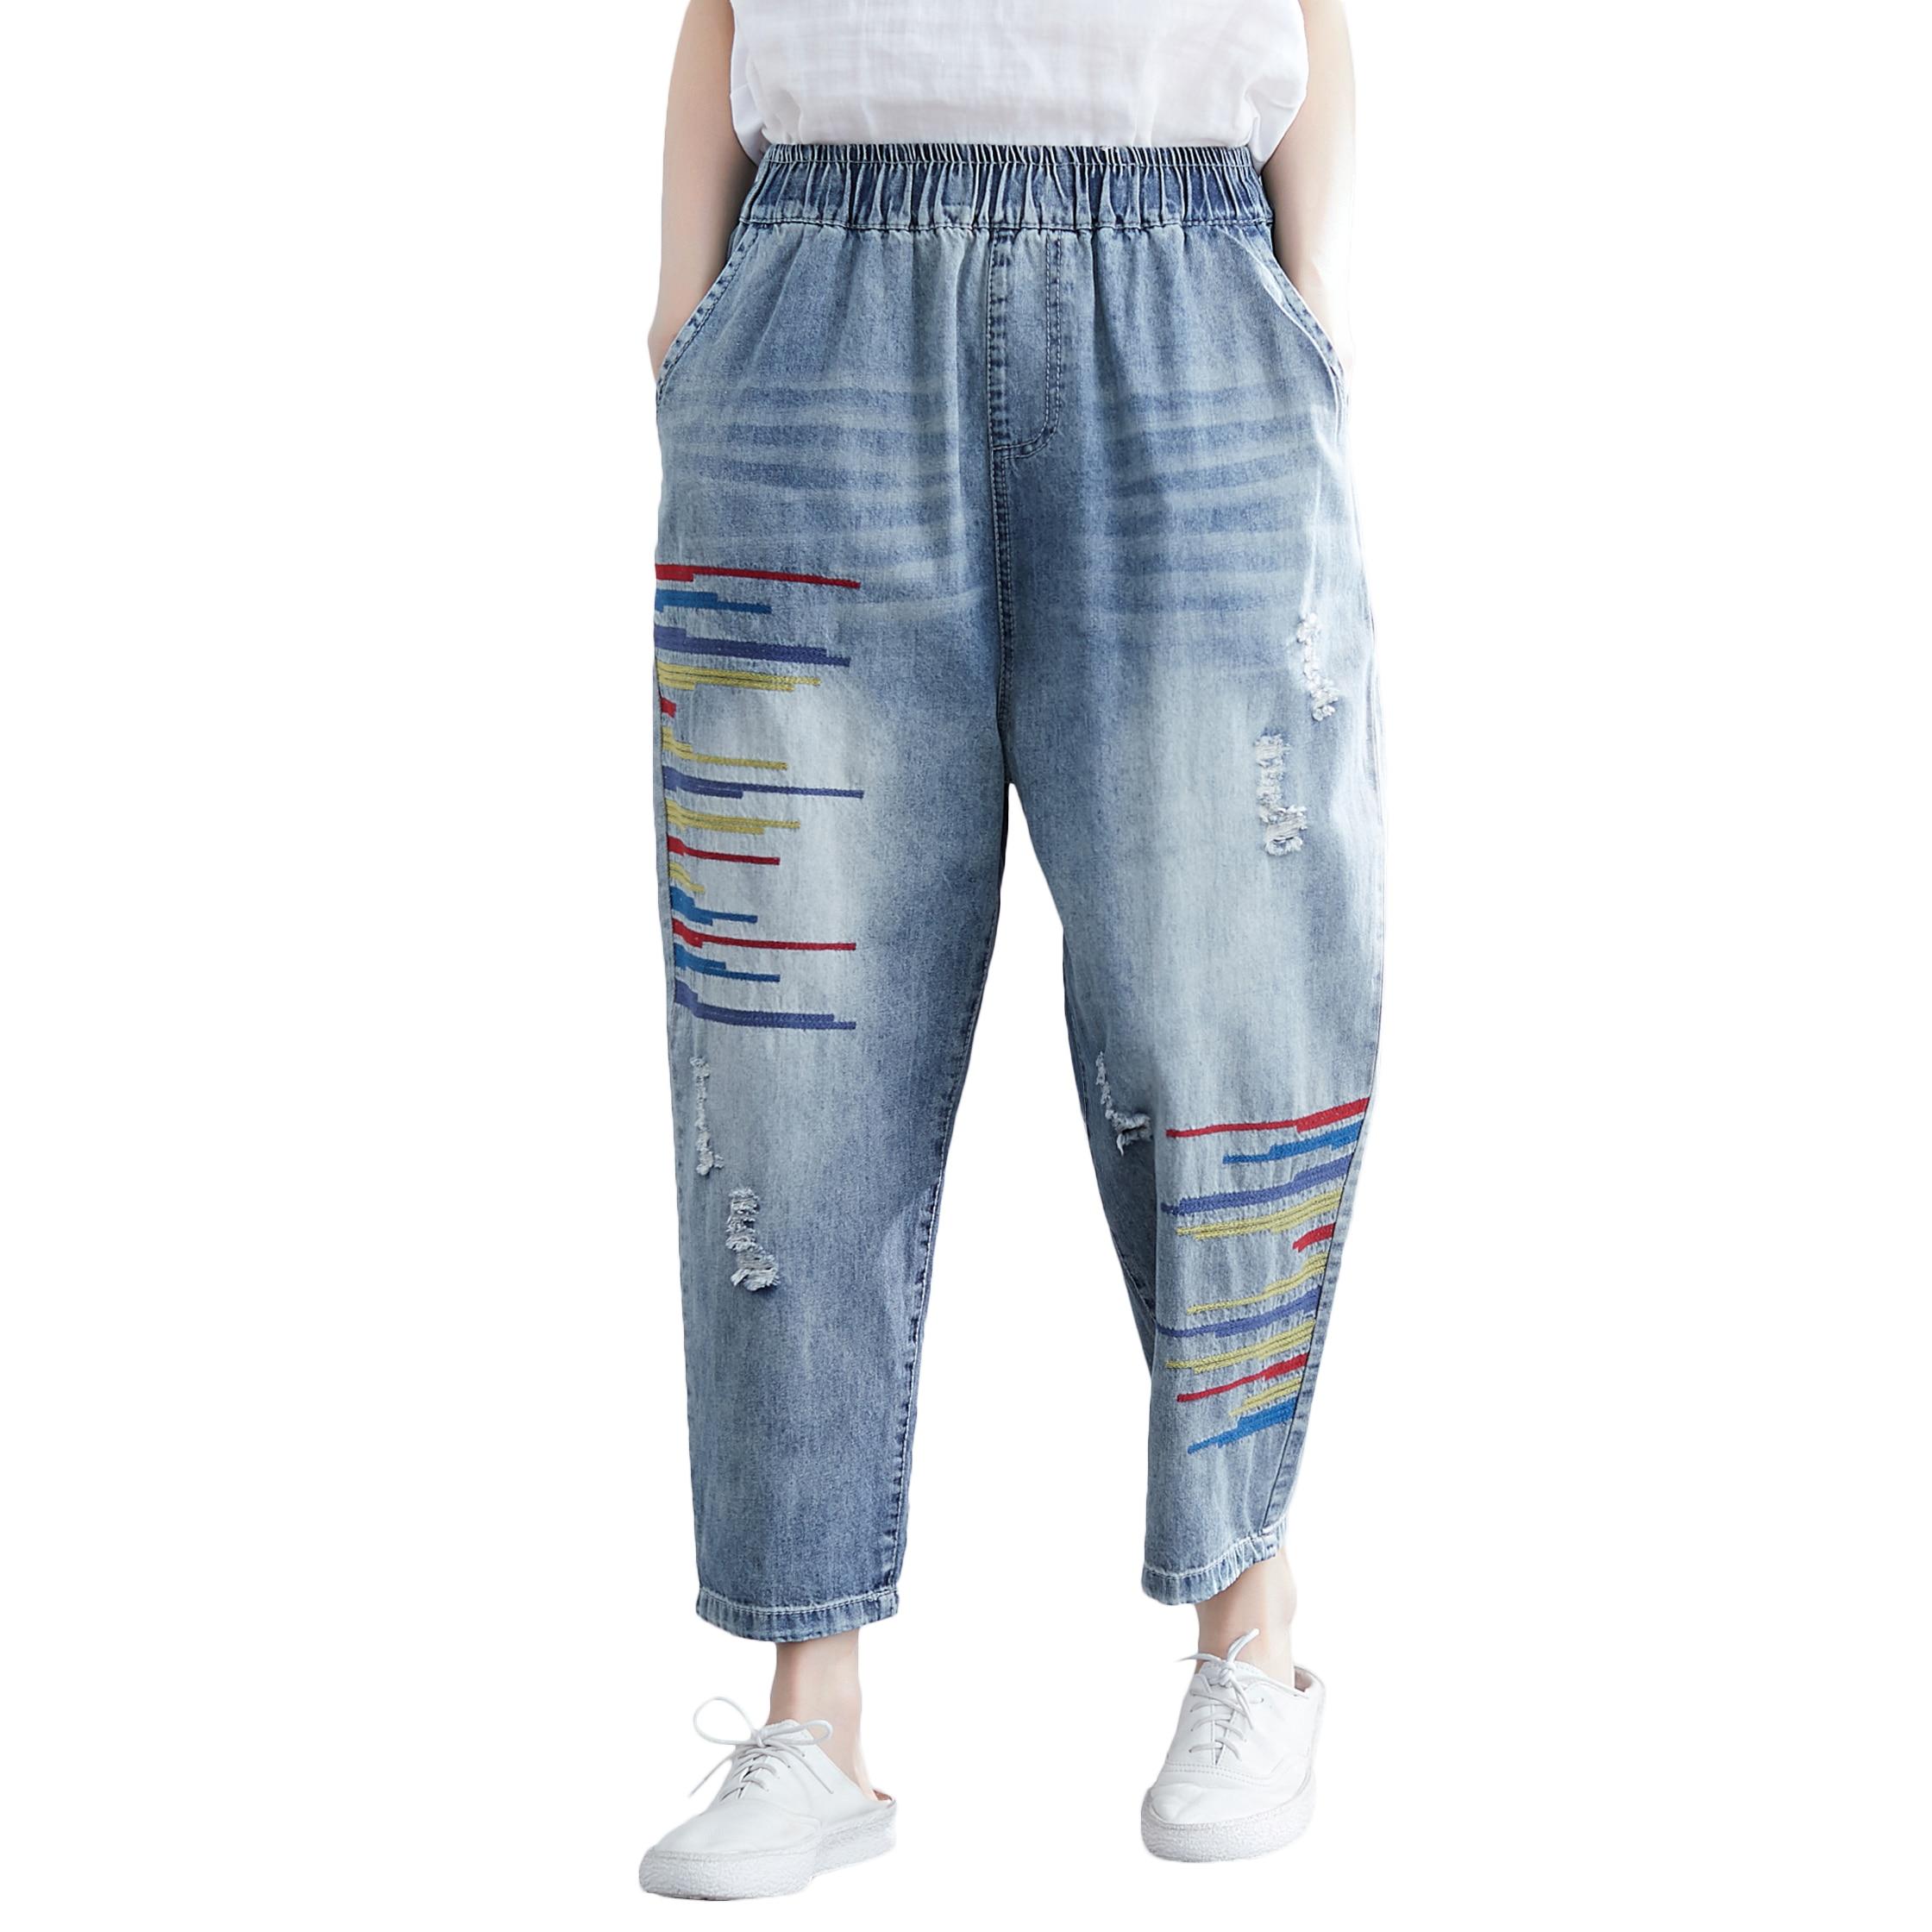 Hole Casual Jeans Women Spring Summer Elastic Waist Loose Vintage Denim Harem Pants Large Size Casual Pants Women's Clothing AH2